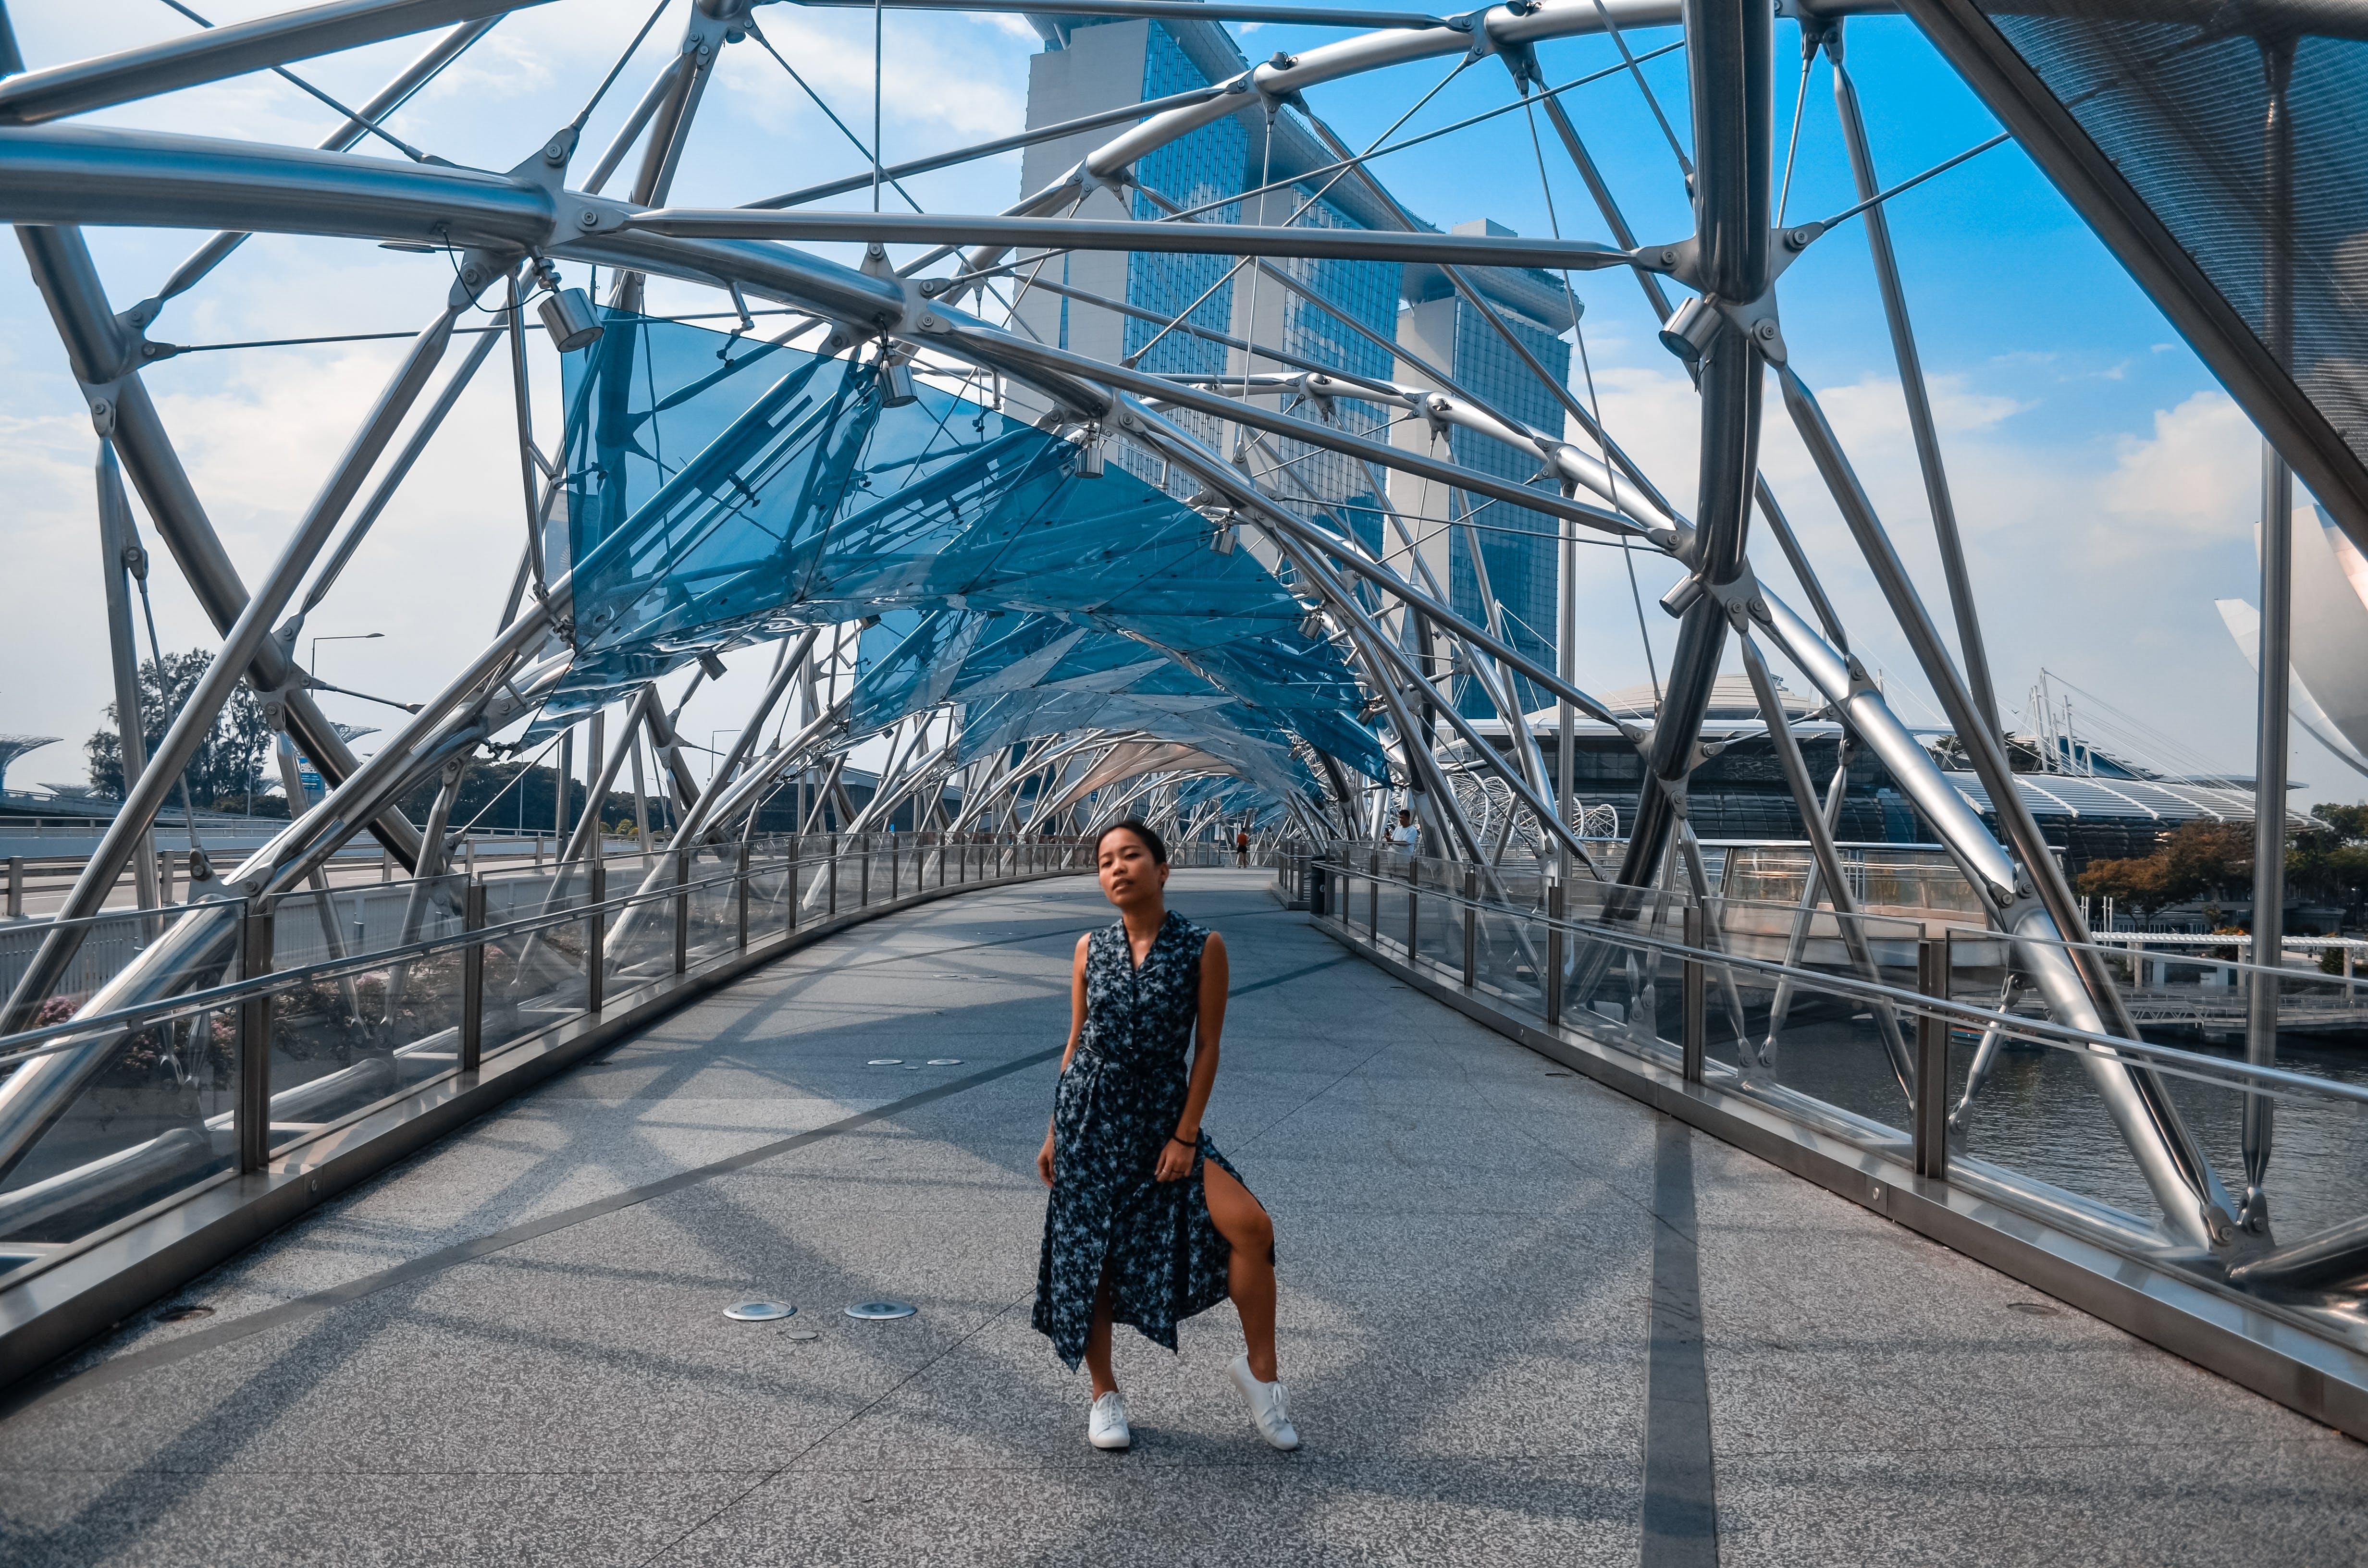 Free stock photo of #urban, urban photography